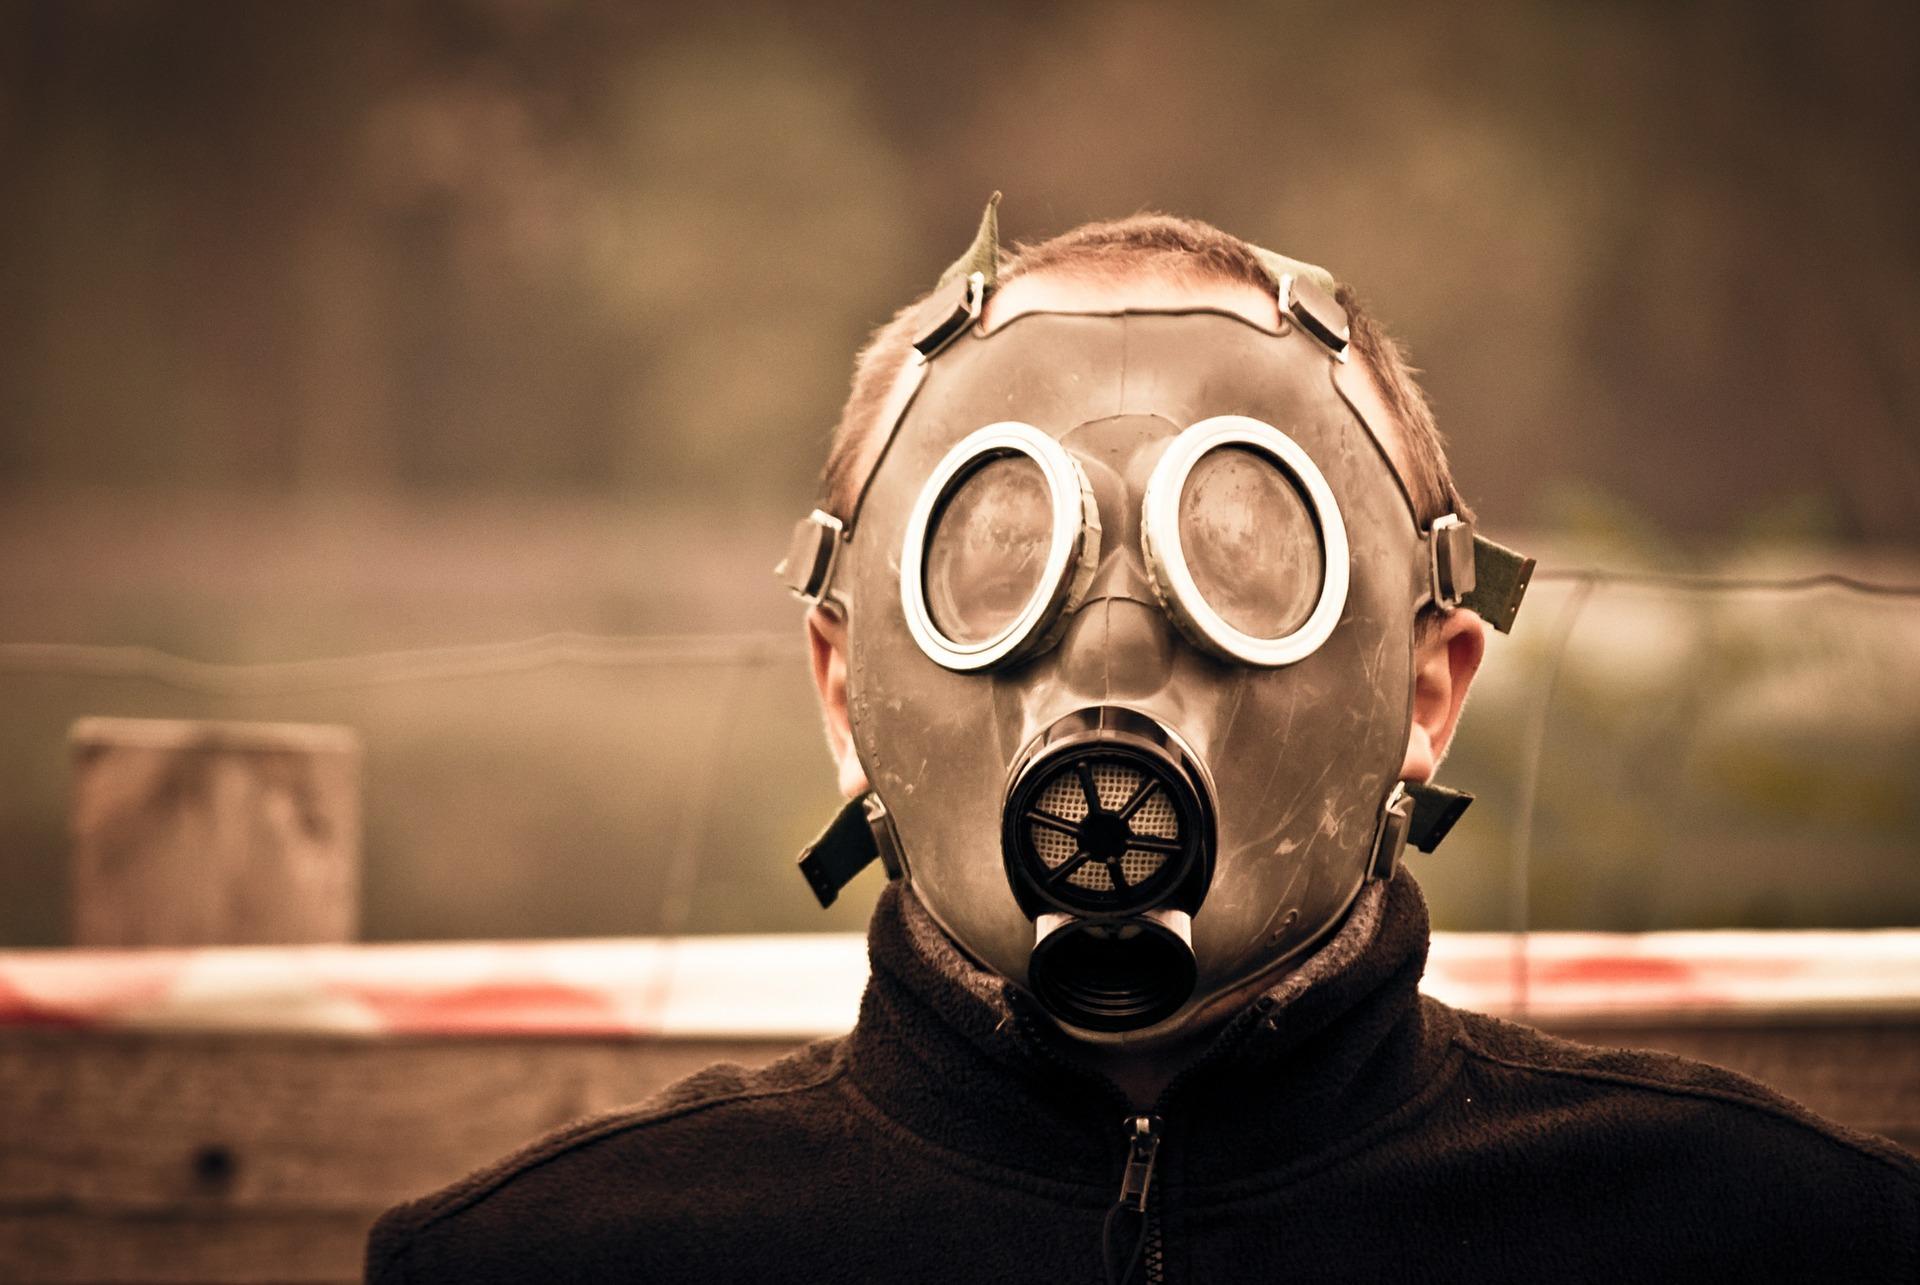 gas-mask-469217_1920.jpg